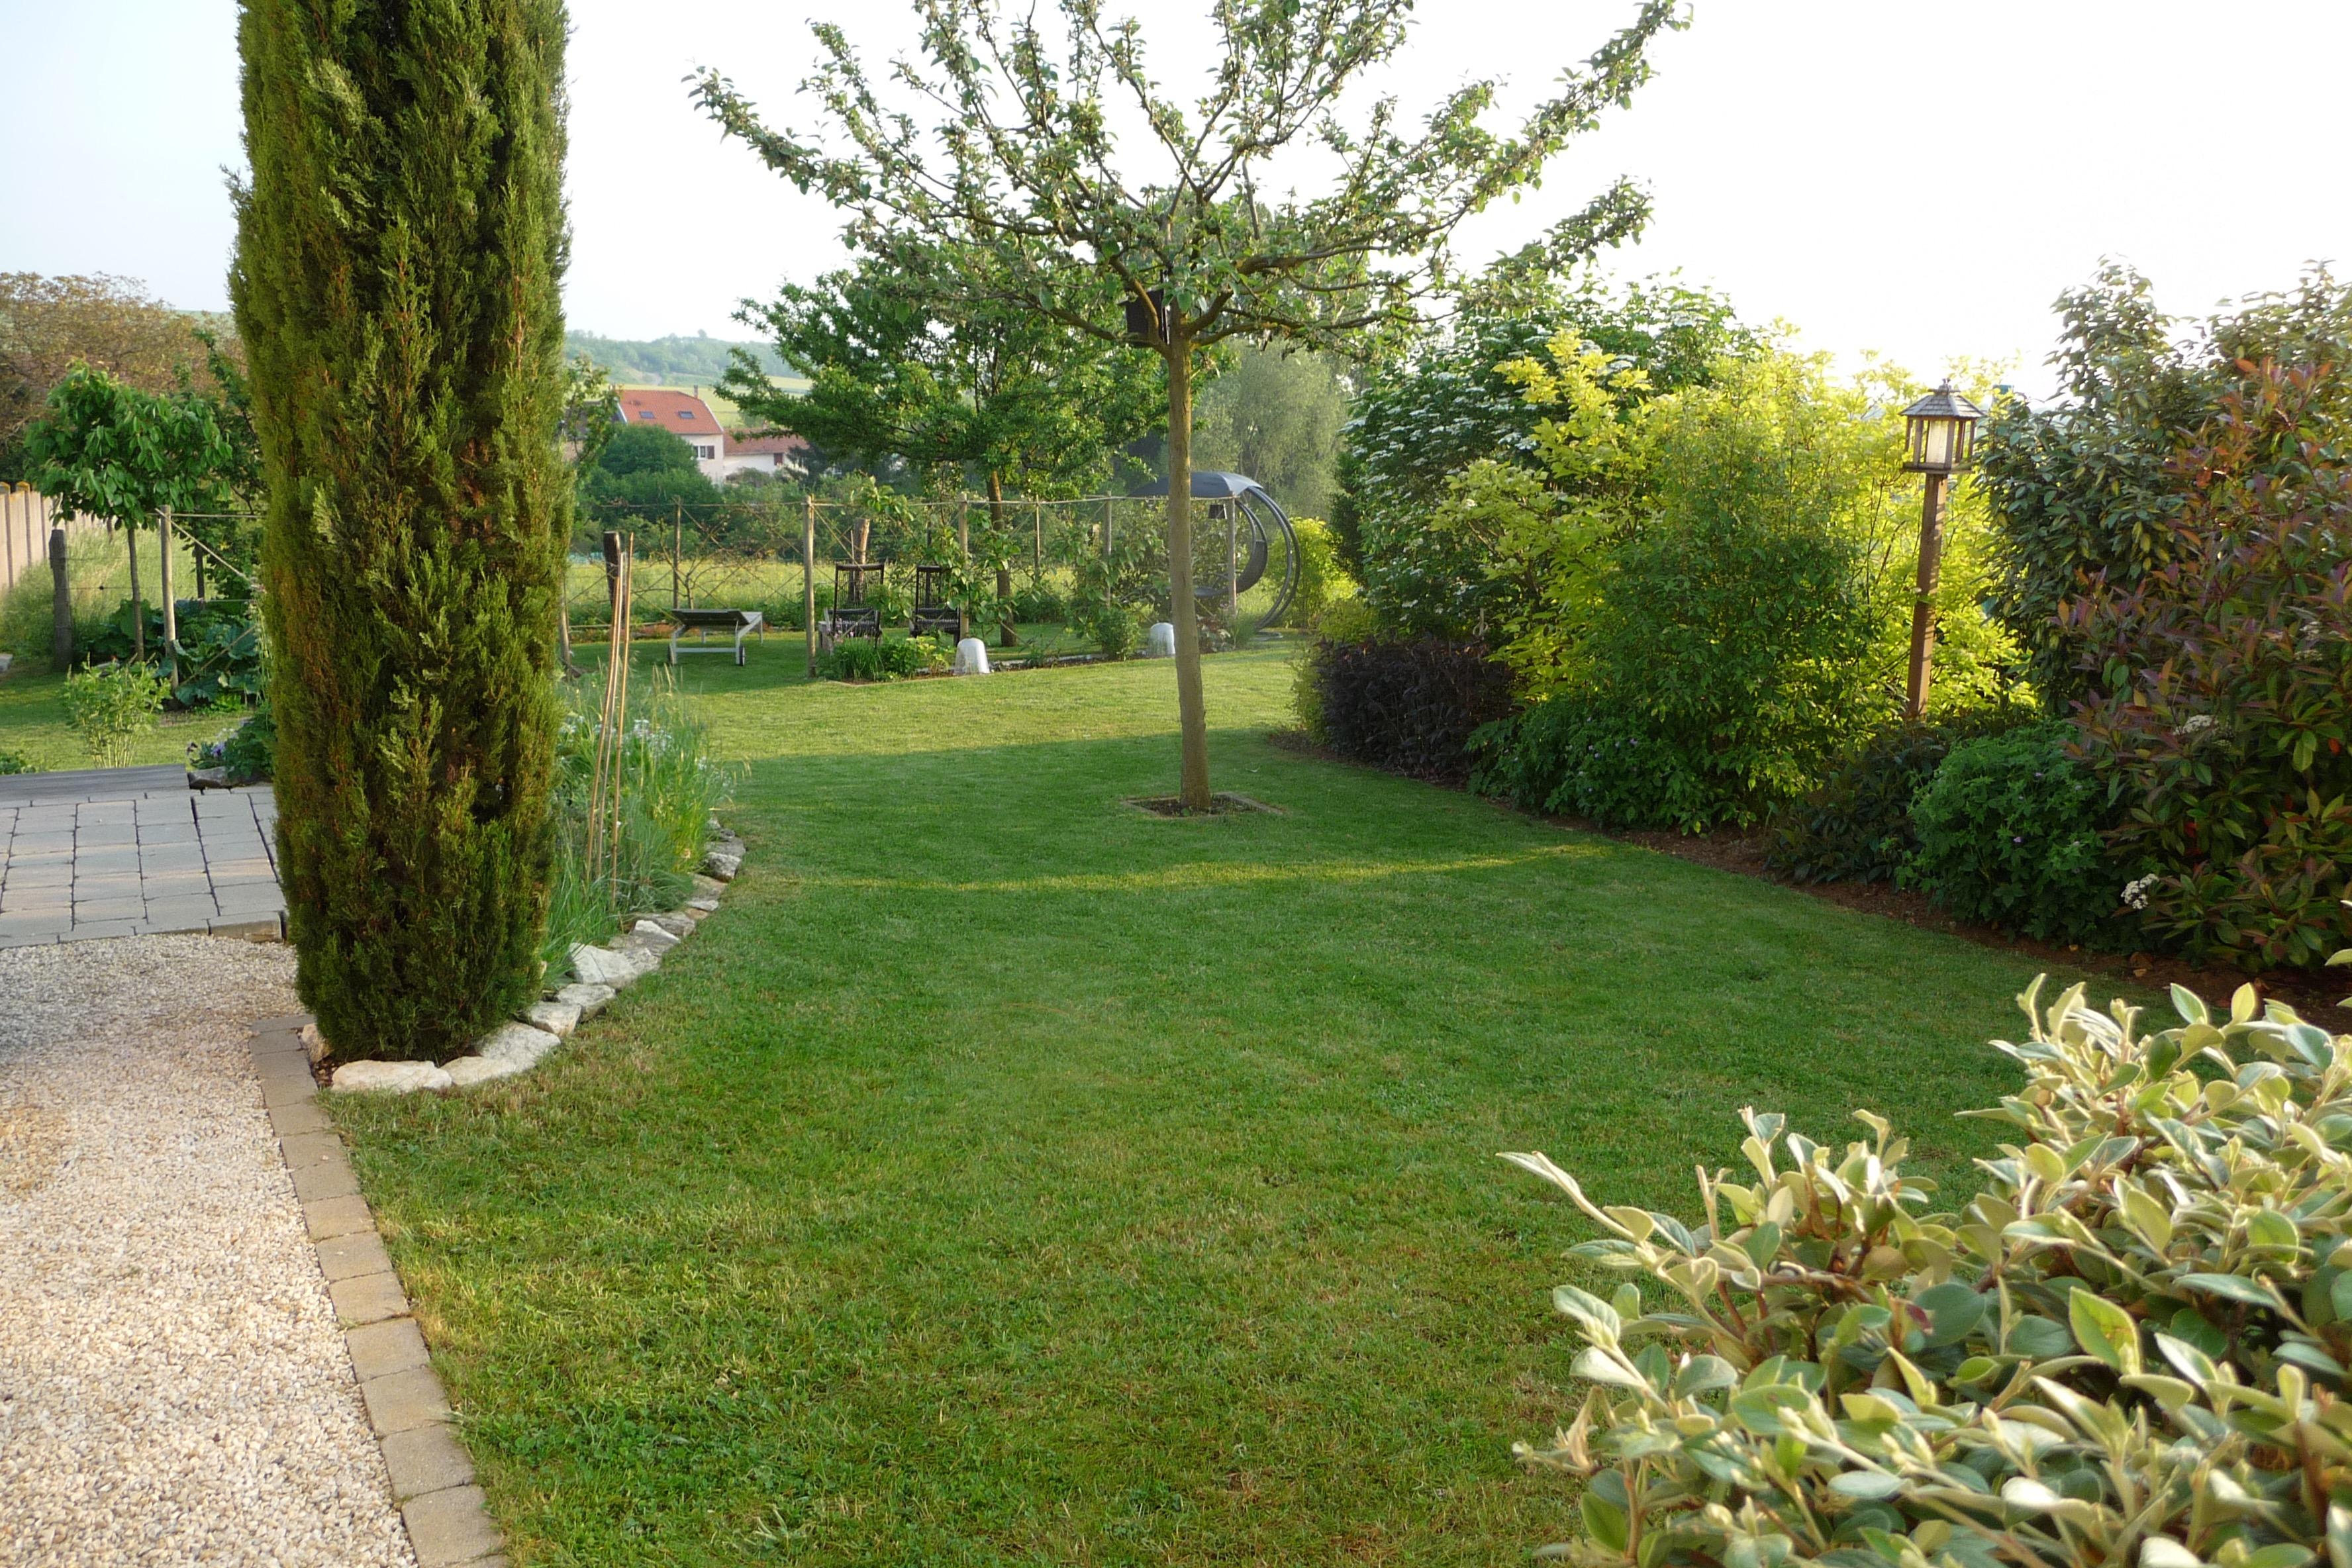 Jardin Paysager : Création D'un Jardin De Campagne encequiconcerne Petit Jardin Paysager